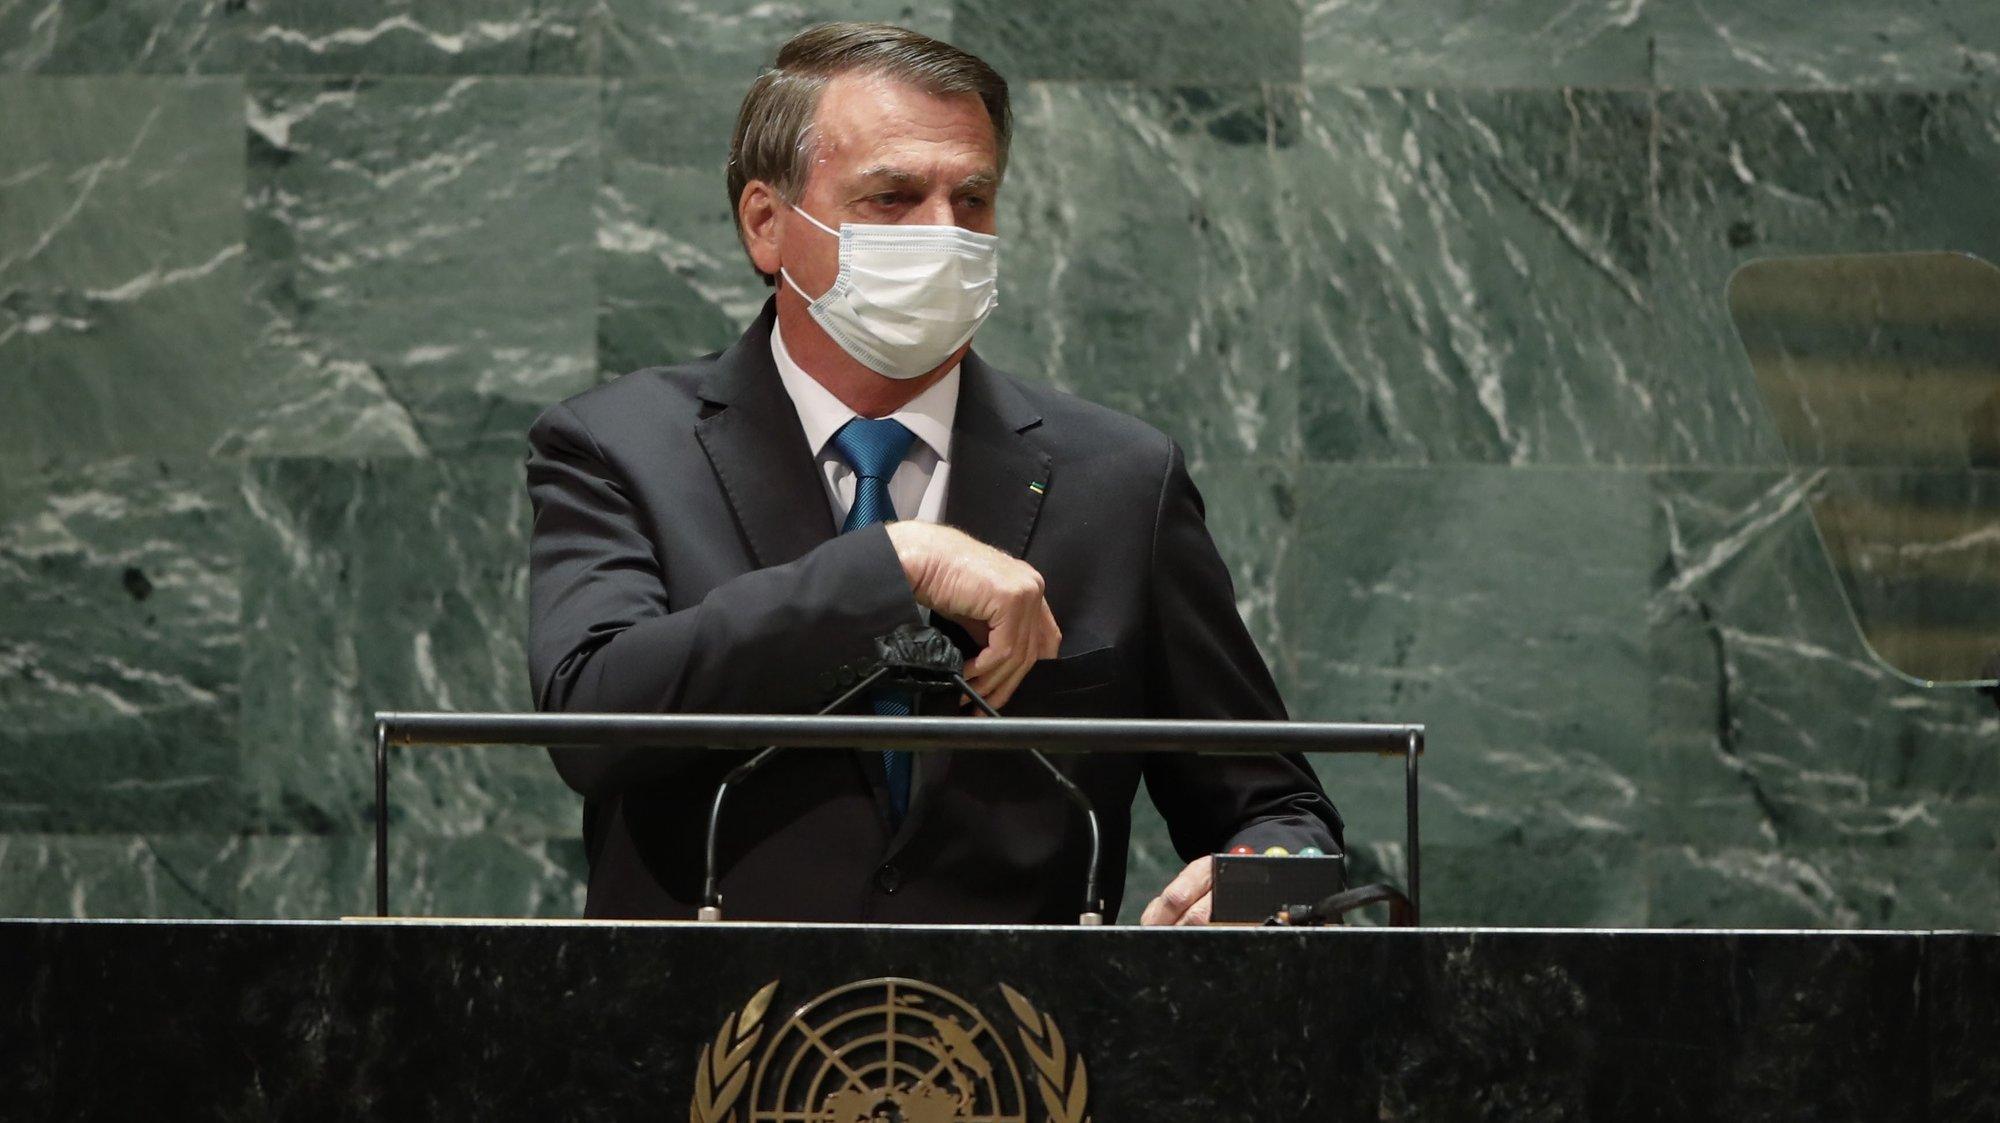 epa09479374 Brazil's President Jair Bolsonaro arrives to address the 76th Session of the UN General Assembly in New York City, USA, 21 September 2021.  EPA/EDUARDO MUNOZ / POOL